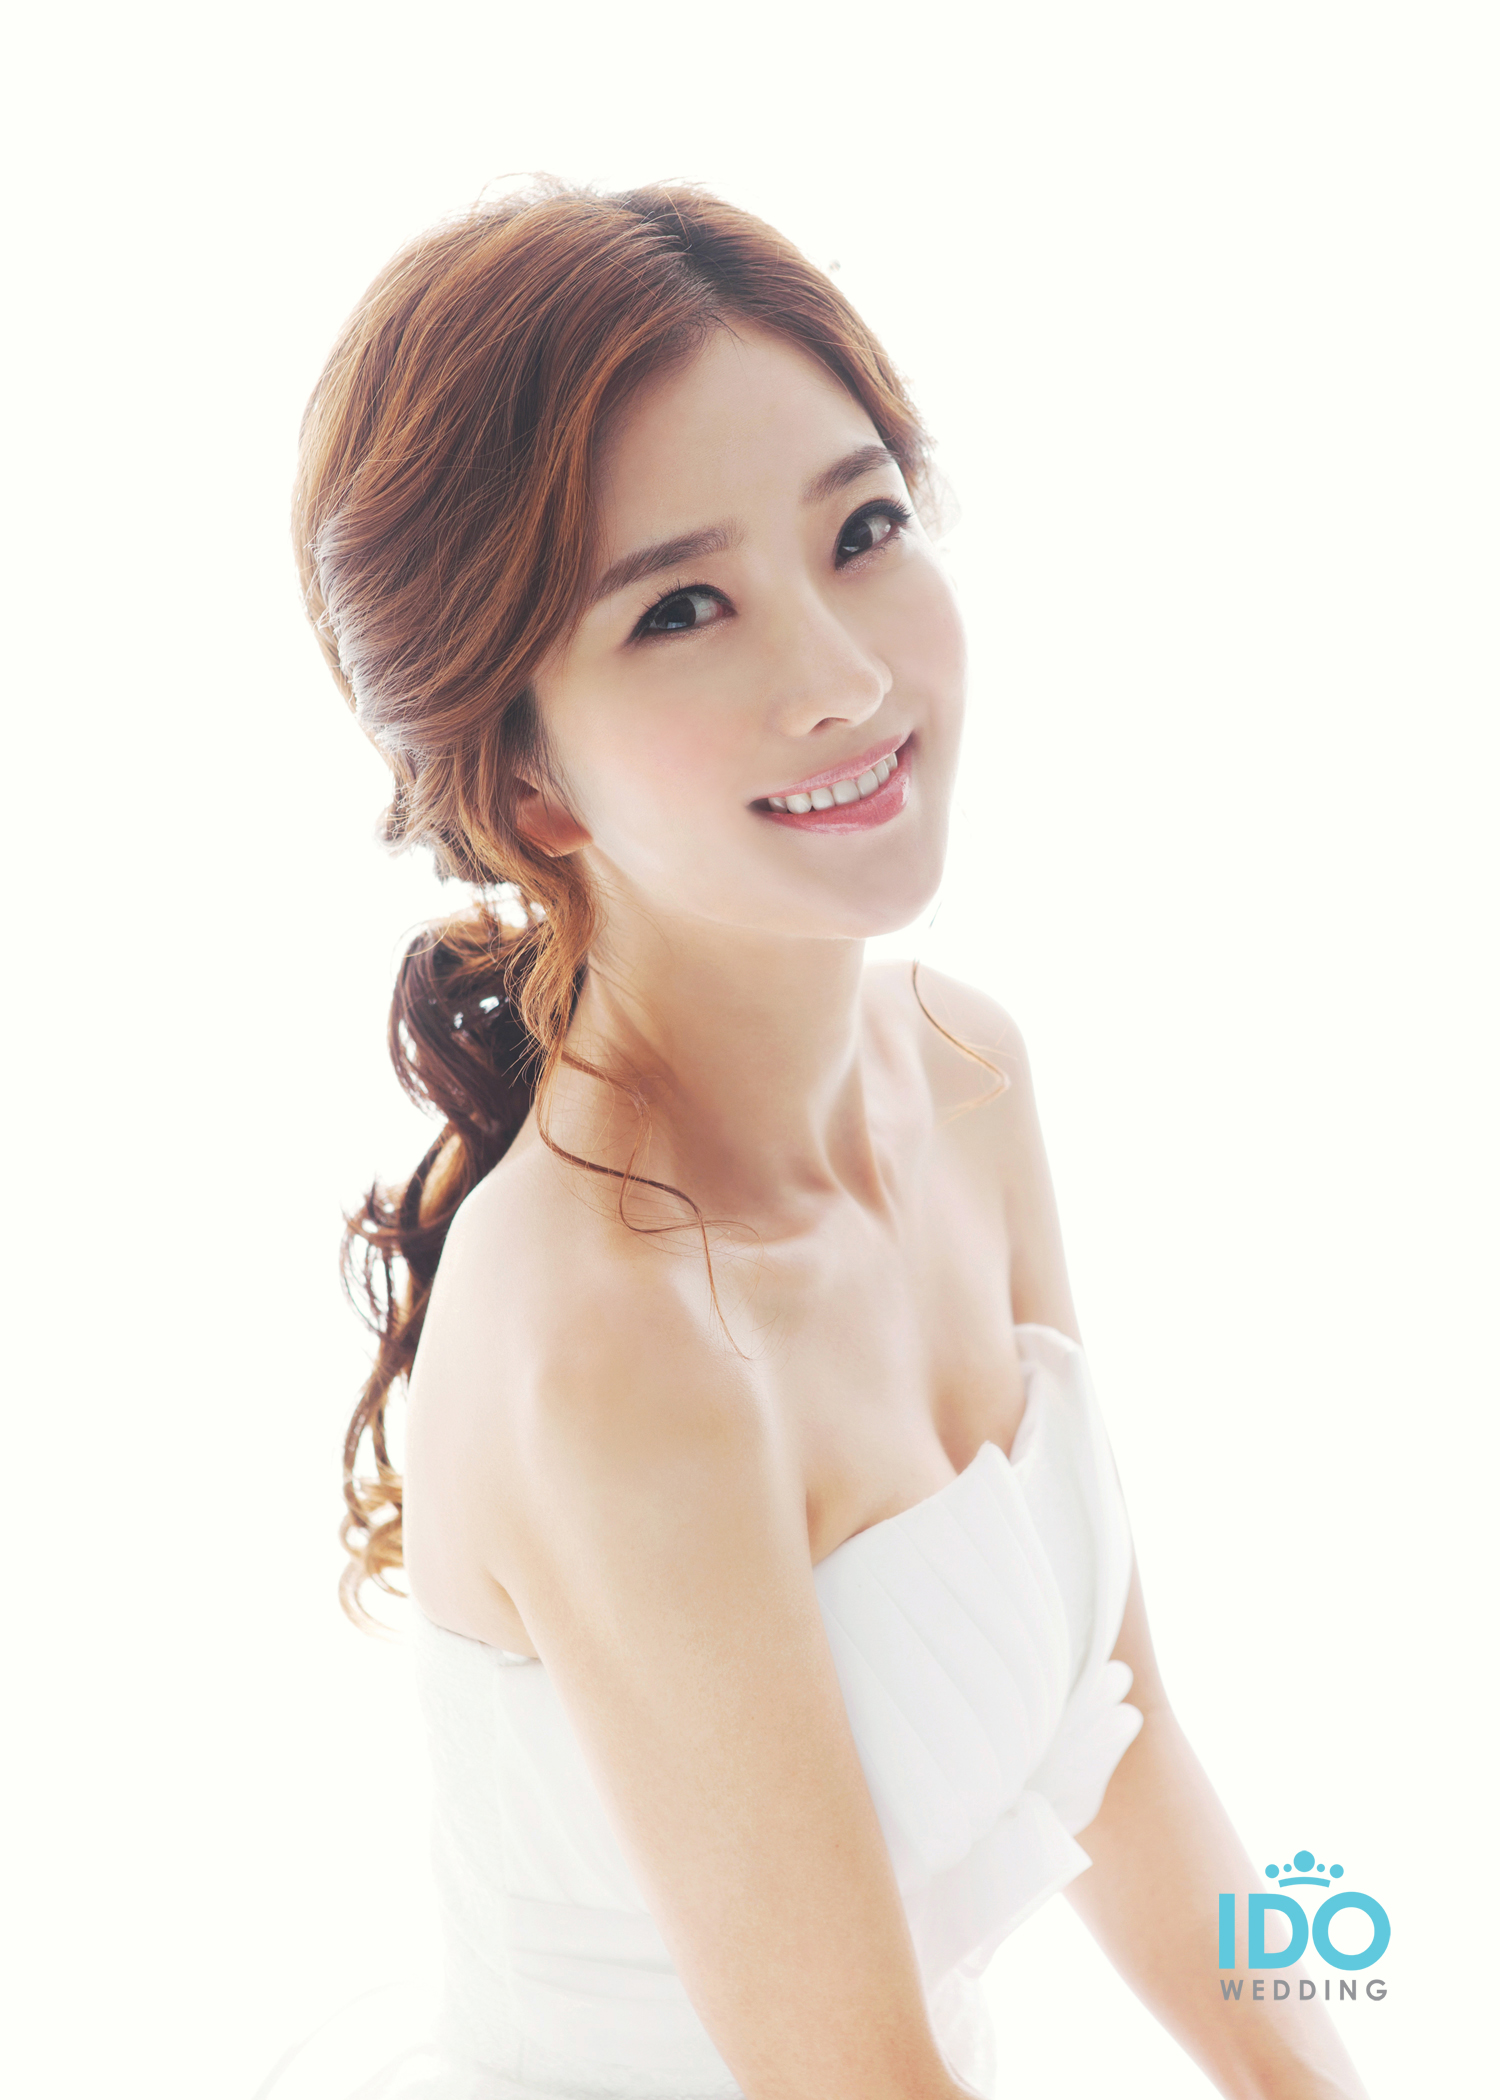 Images Korean Wedding Make Up : KOREAN WEDDING PHOTO HAIR and MAKEUP STYLE Korean ...